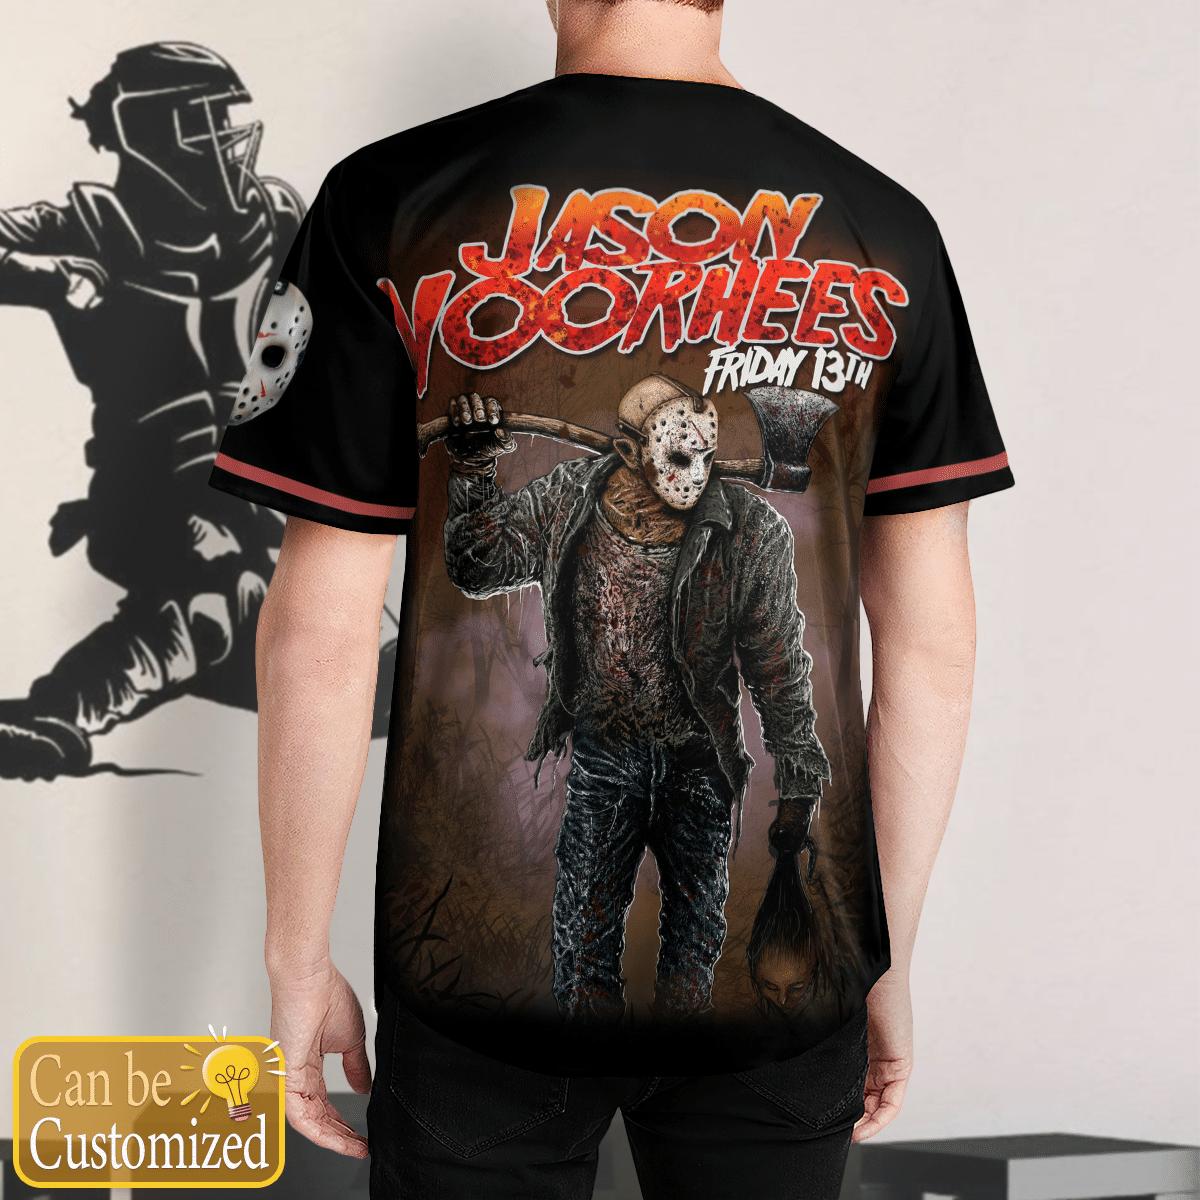 Customized Jason Voorhees killer baseball Jersey Shirt